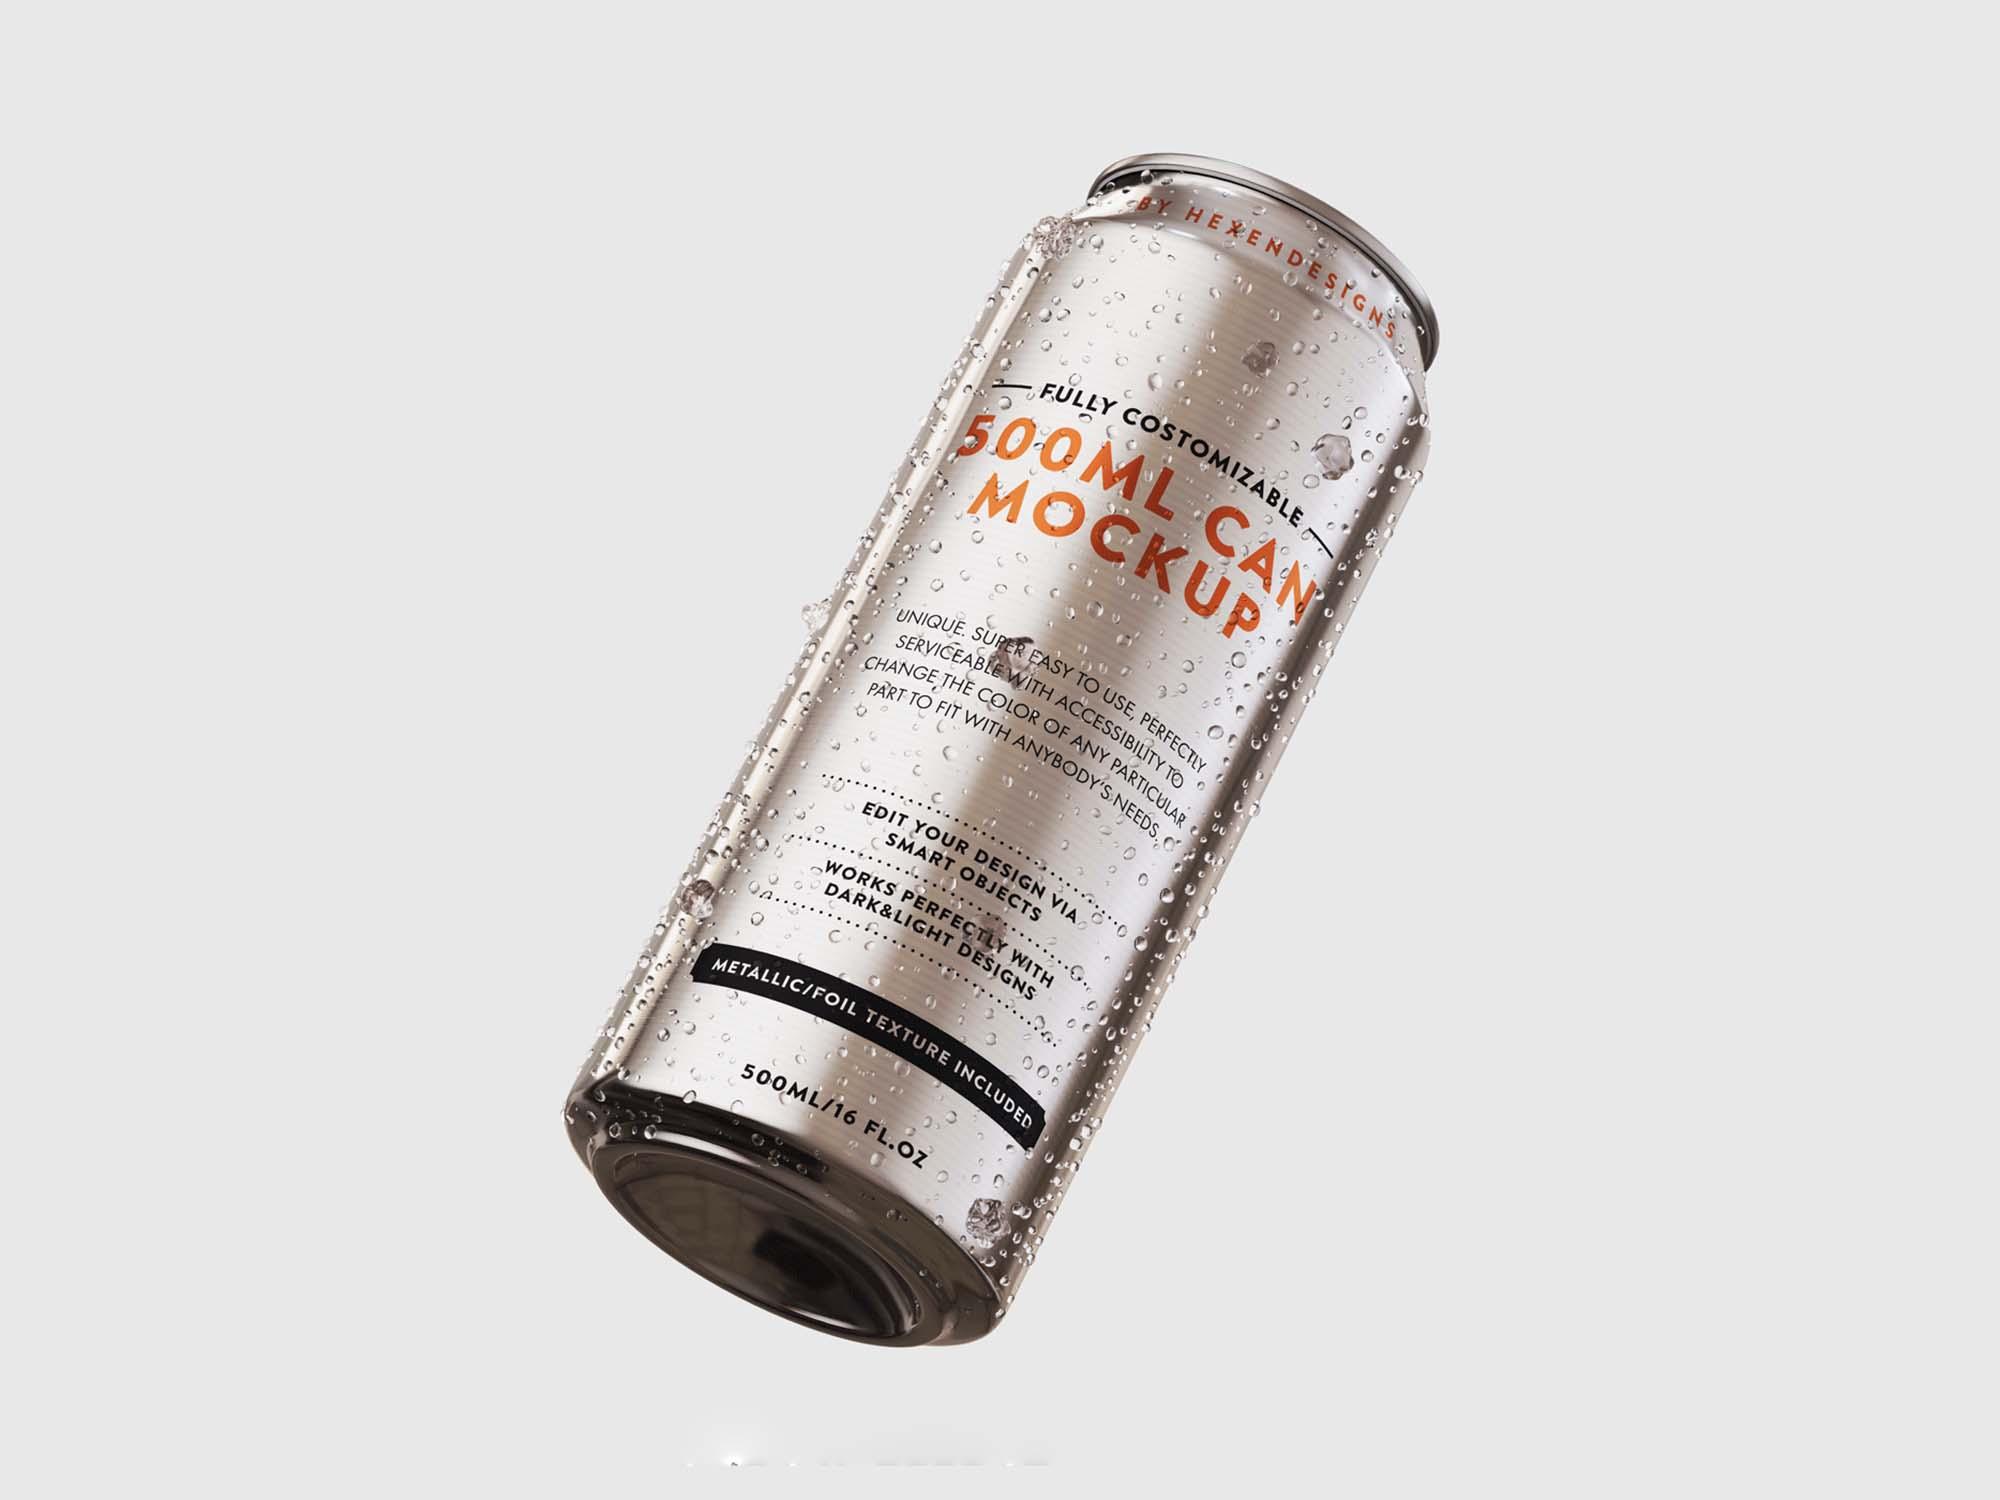 500ml Can Mockup